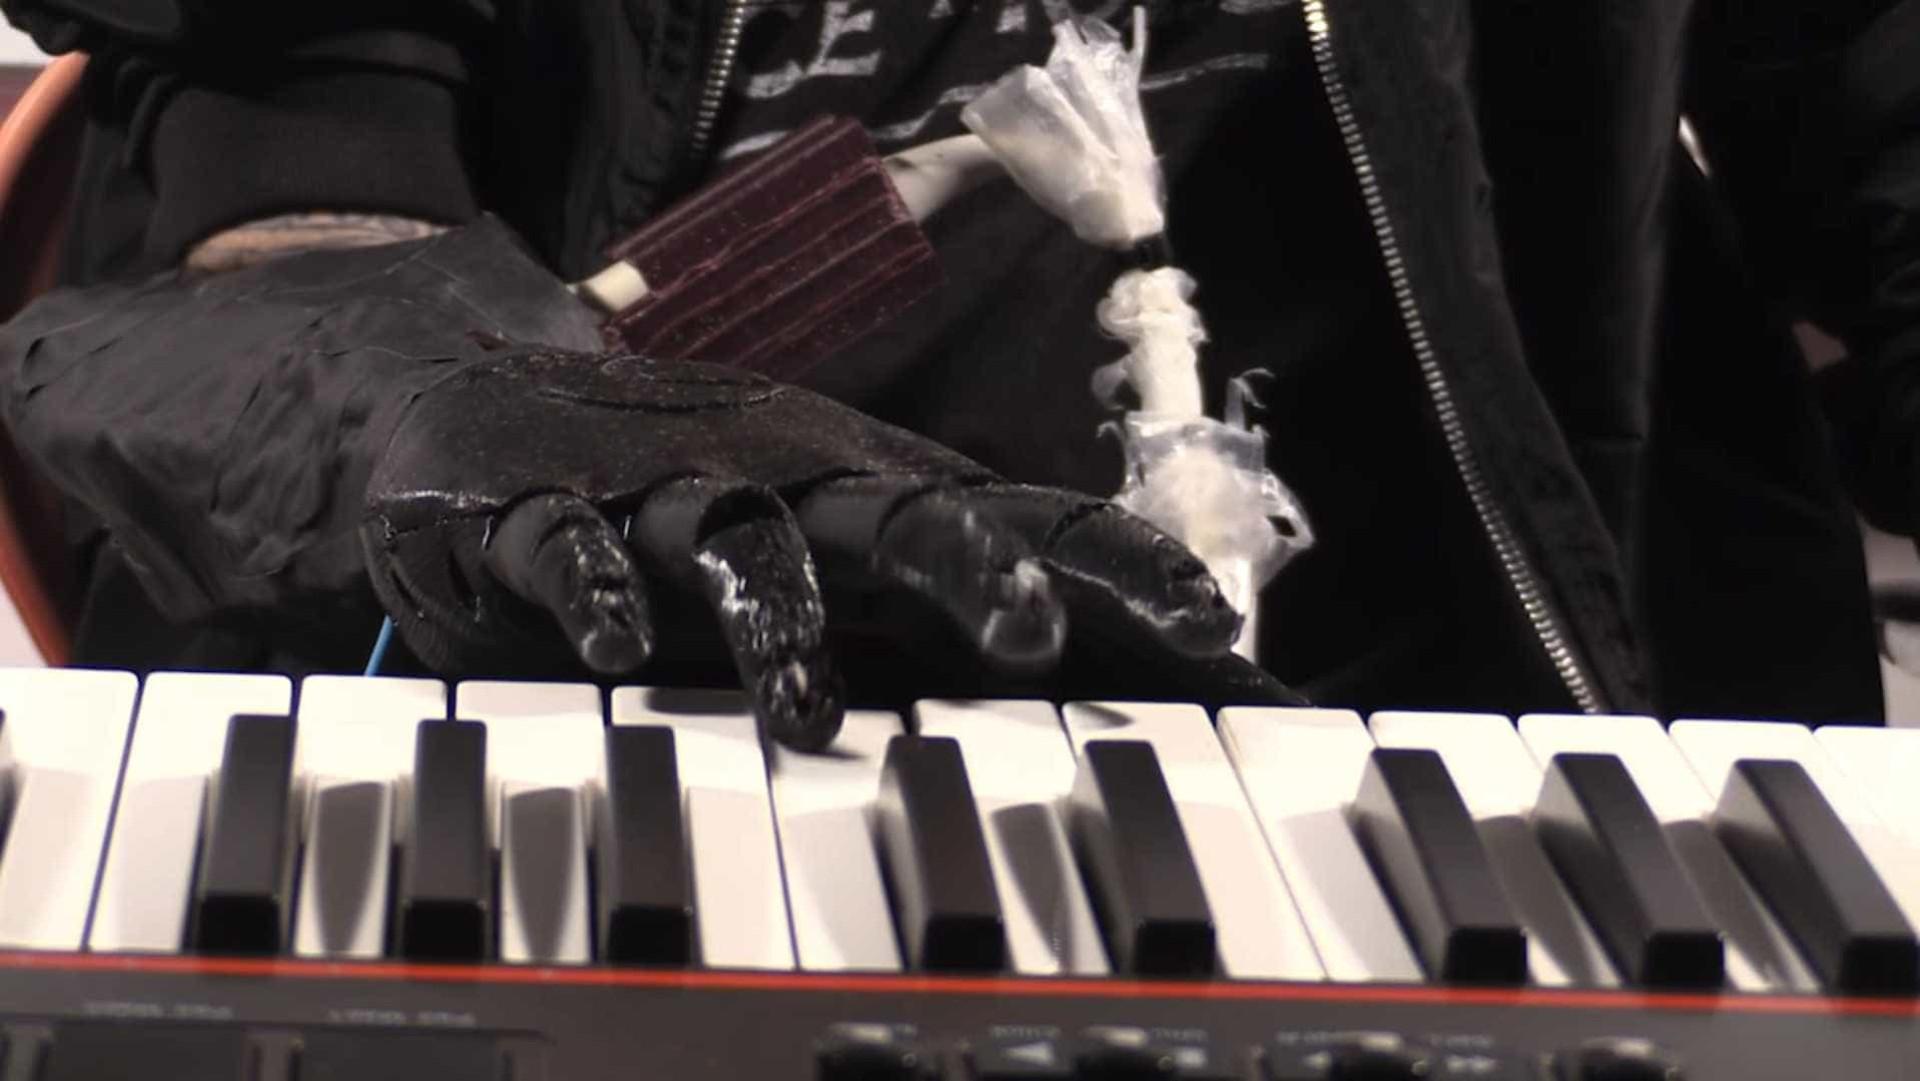 Prótese robótica permite a músico voltar a tocar piano